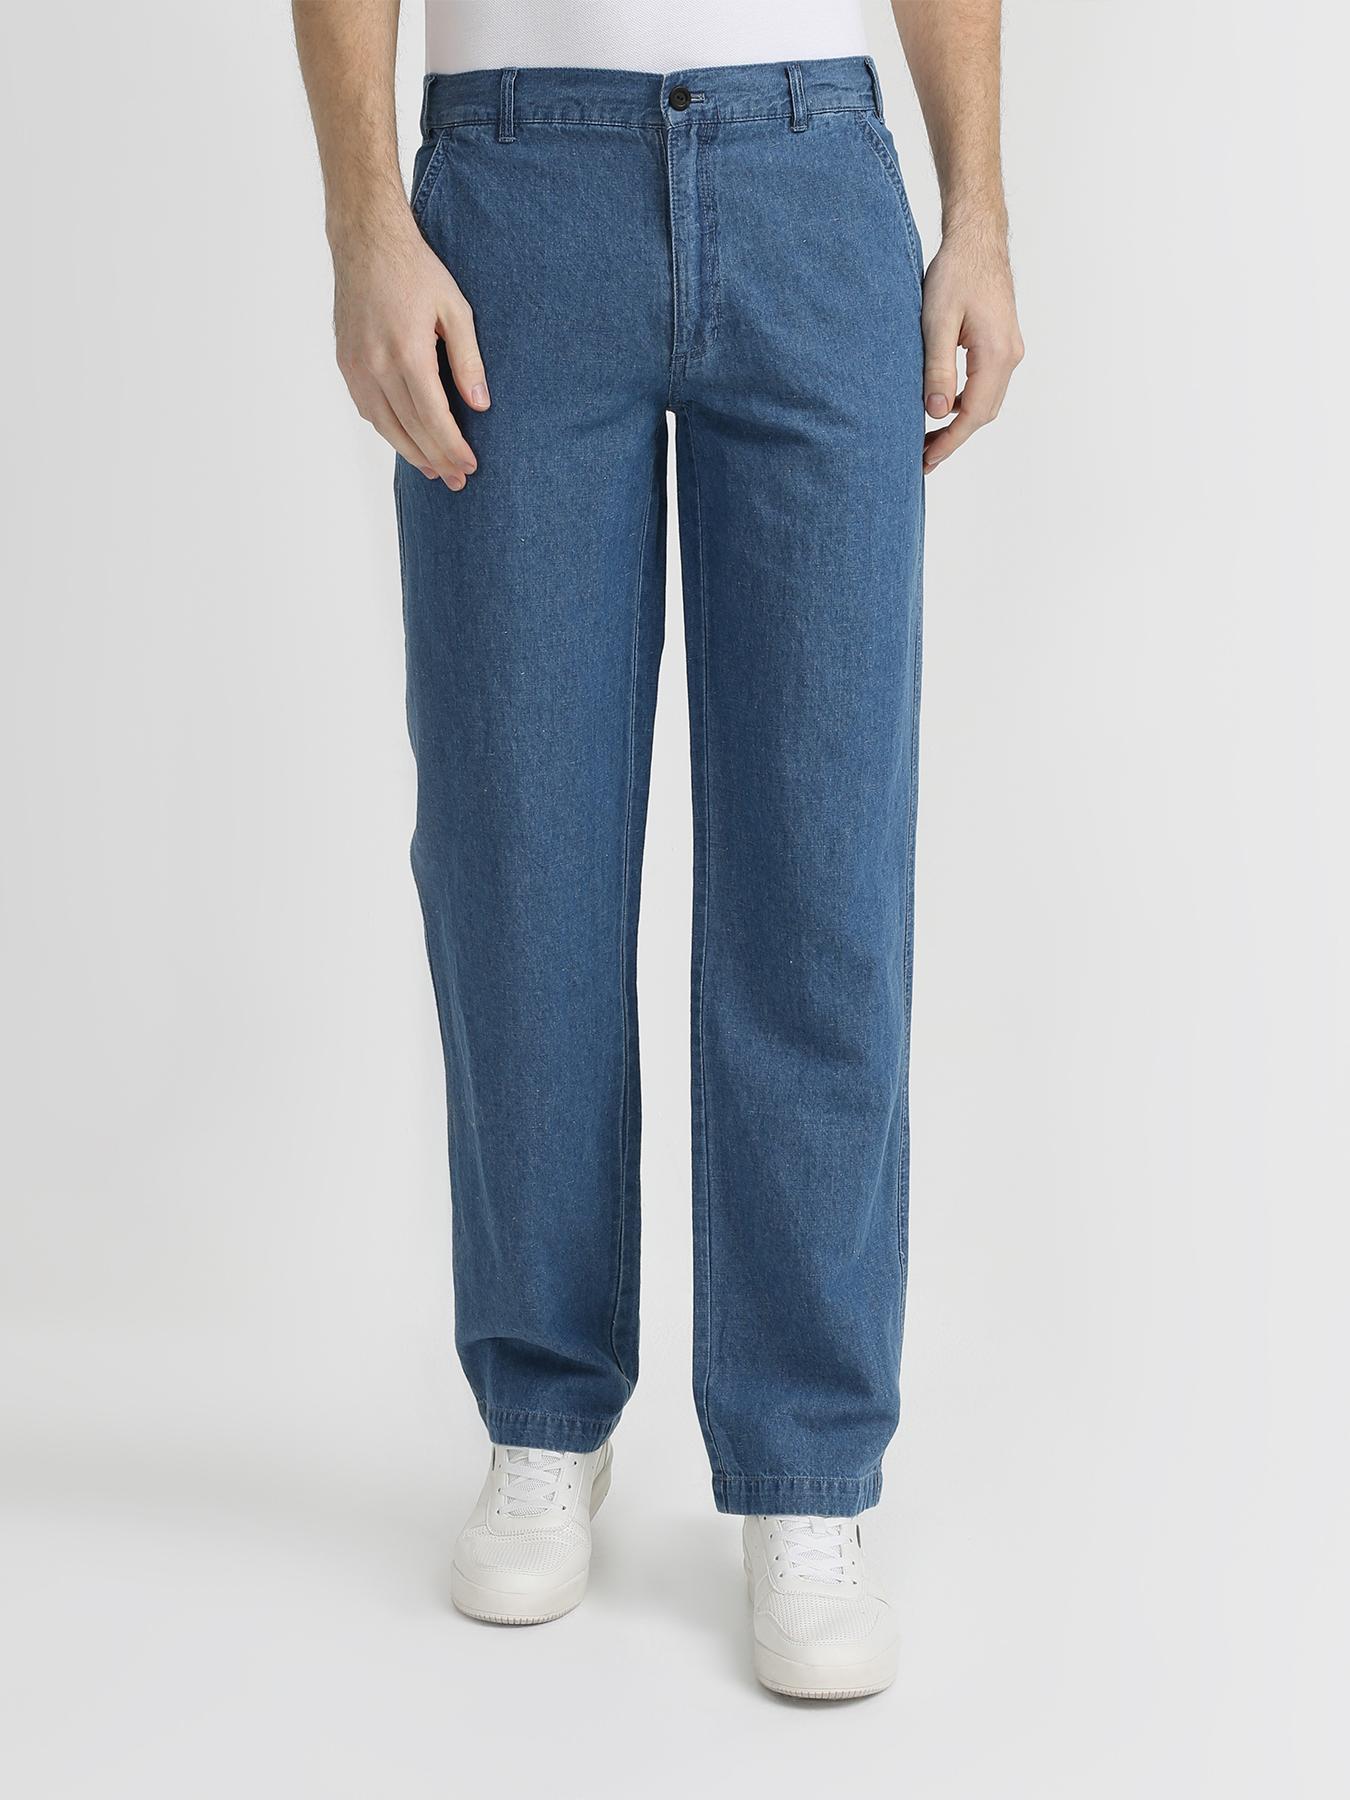 Джинсы Alessandro Manzoni Jeans Джинсы